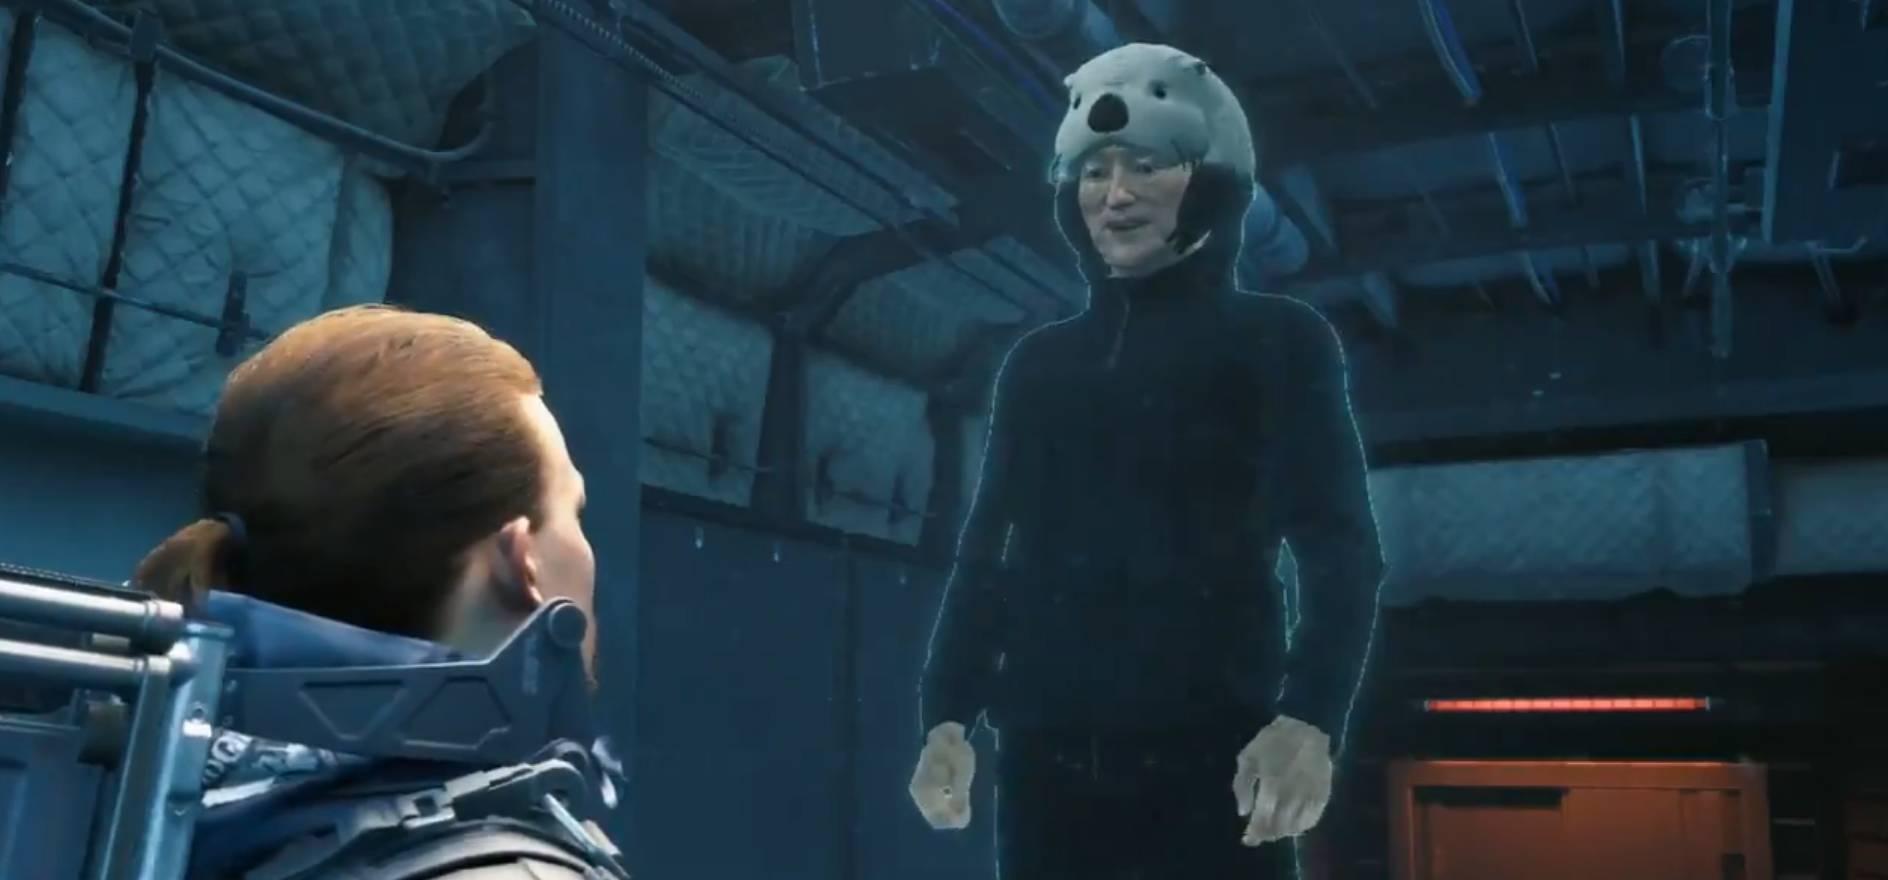 Hideo Kojima Reveals Cameo Of Late Night Host Conan O'Brien In Upcoming Game Death Stranding